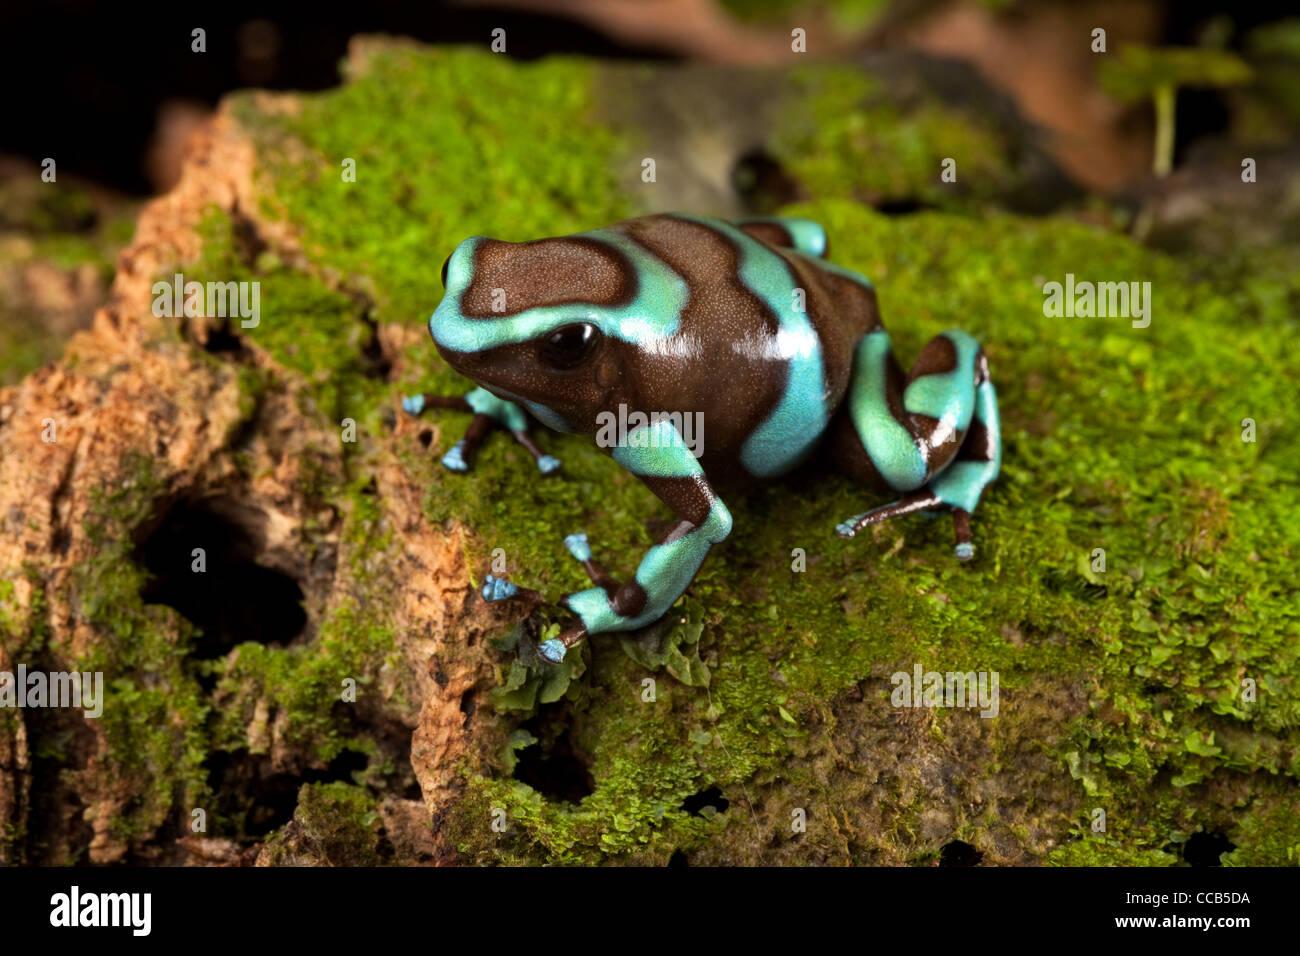 Cute Frog In Terrarium Dendrobates Auratus Poison Dart Frog Of Rain